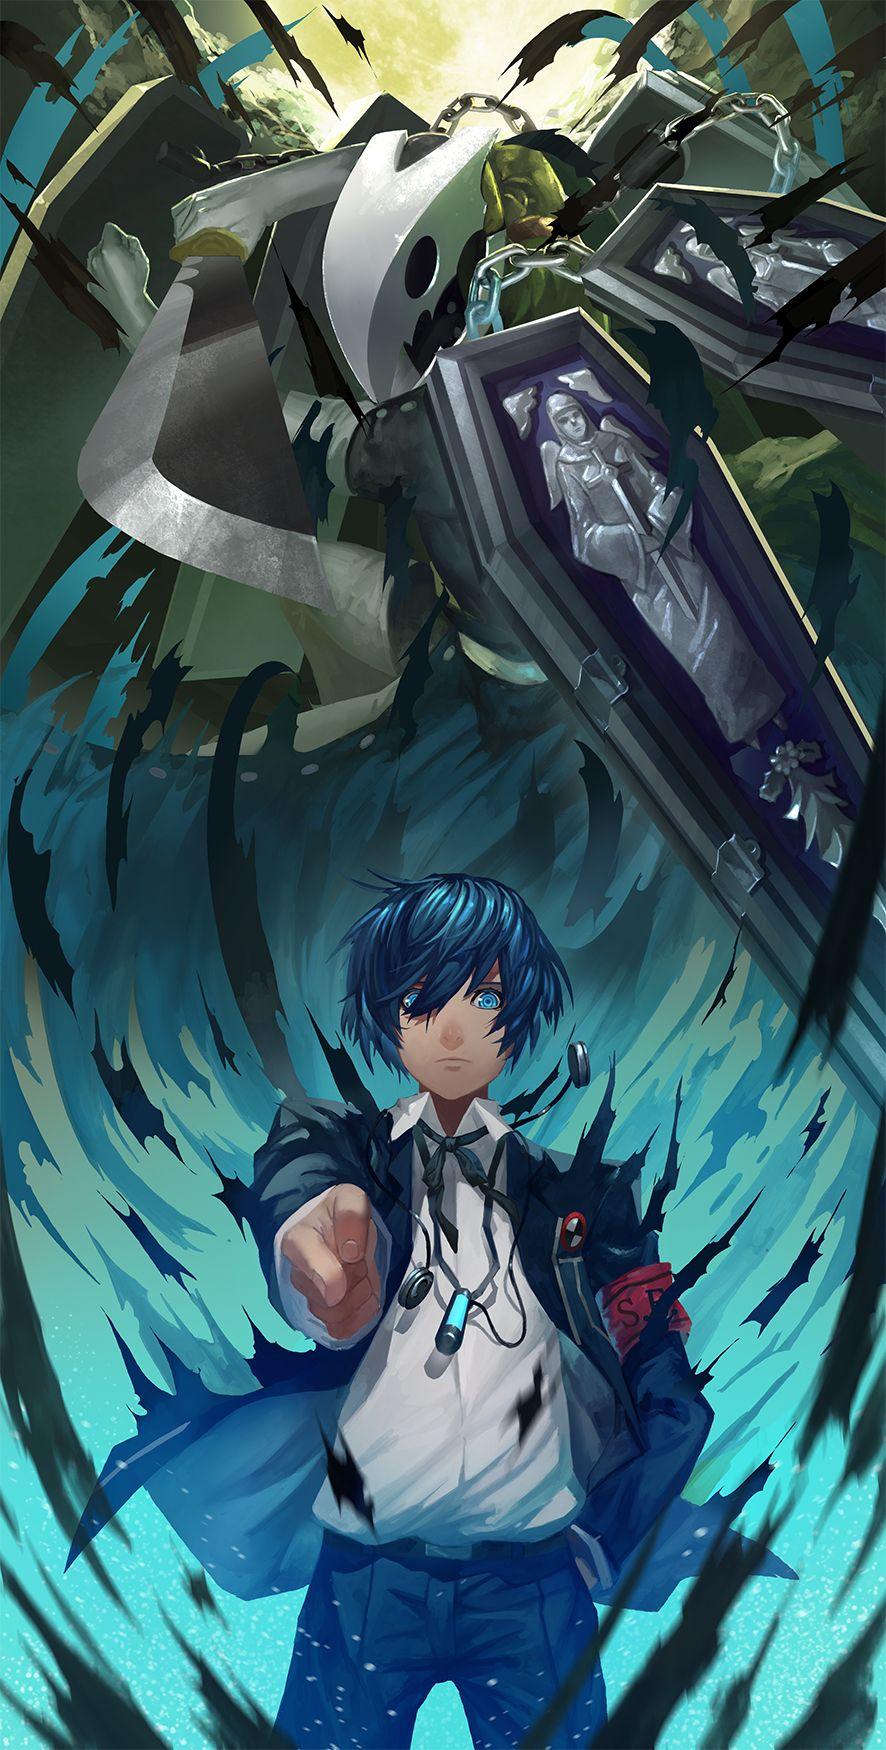 Shin Megami Tensei Persona 3 1712988 Persona Anime Persona 3 Thanatos